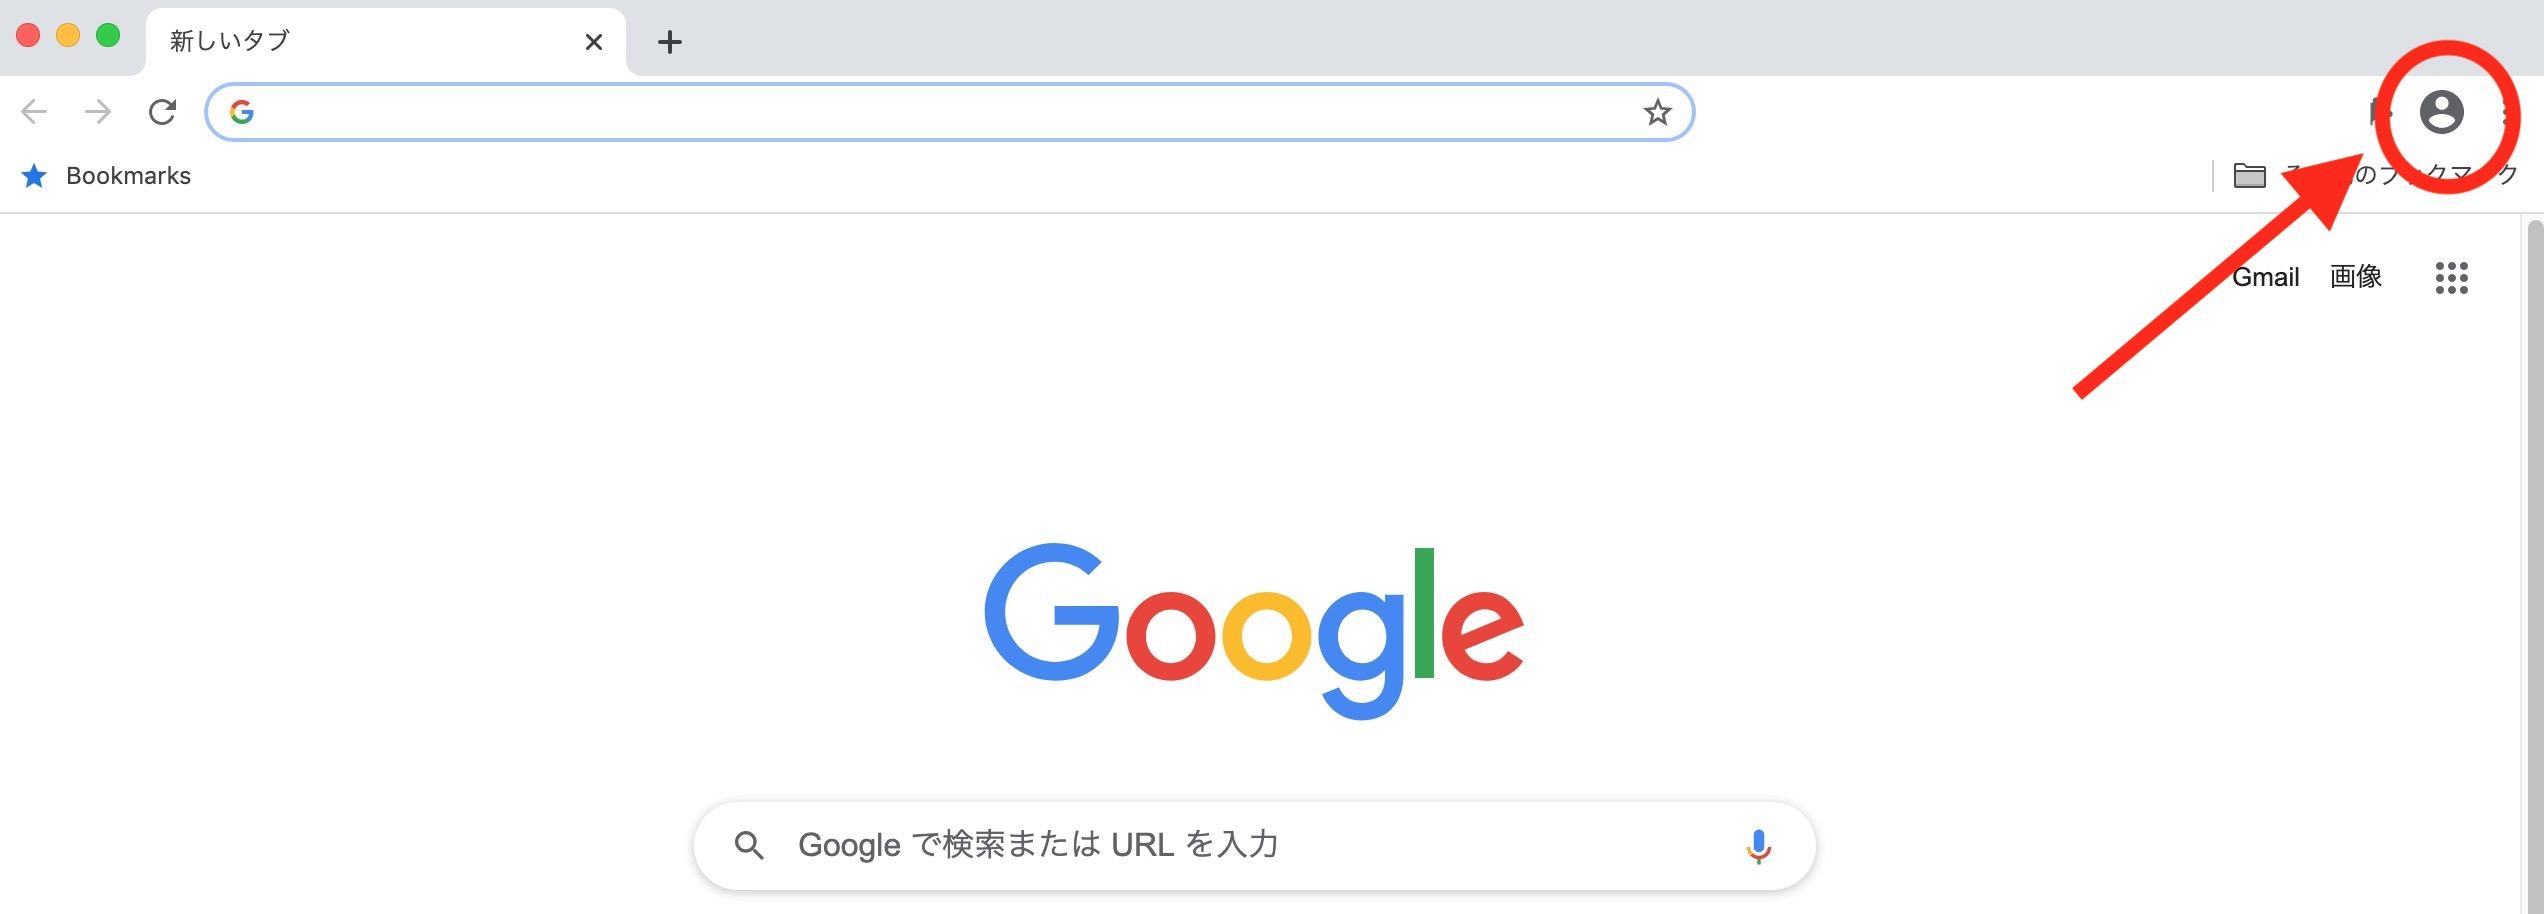 Google Chromeログイン